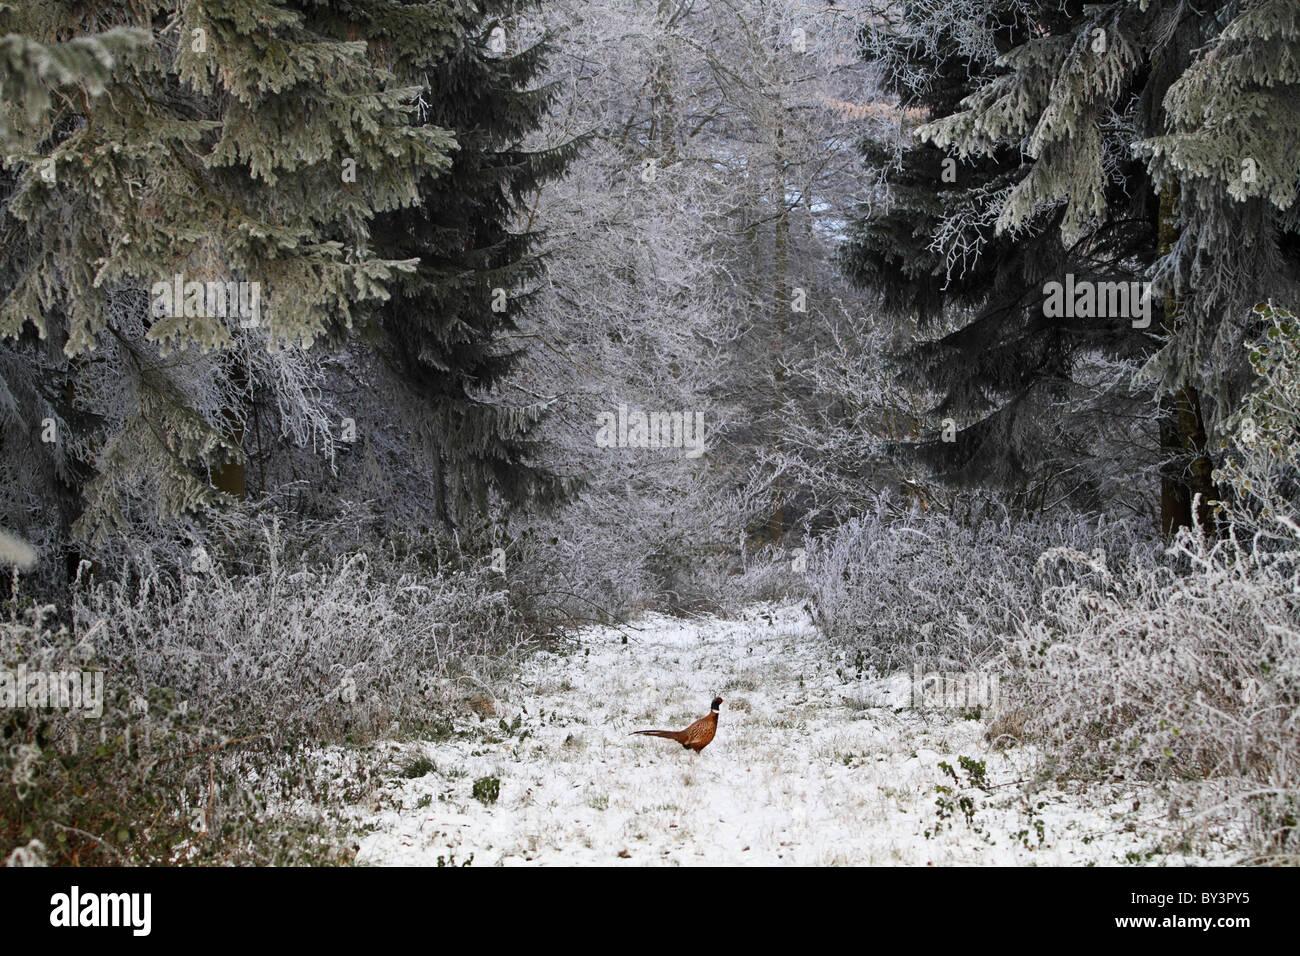 Fasan im Schnee Jagd winter Stockbild